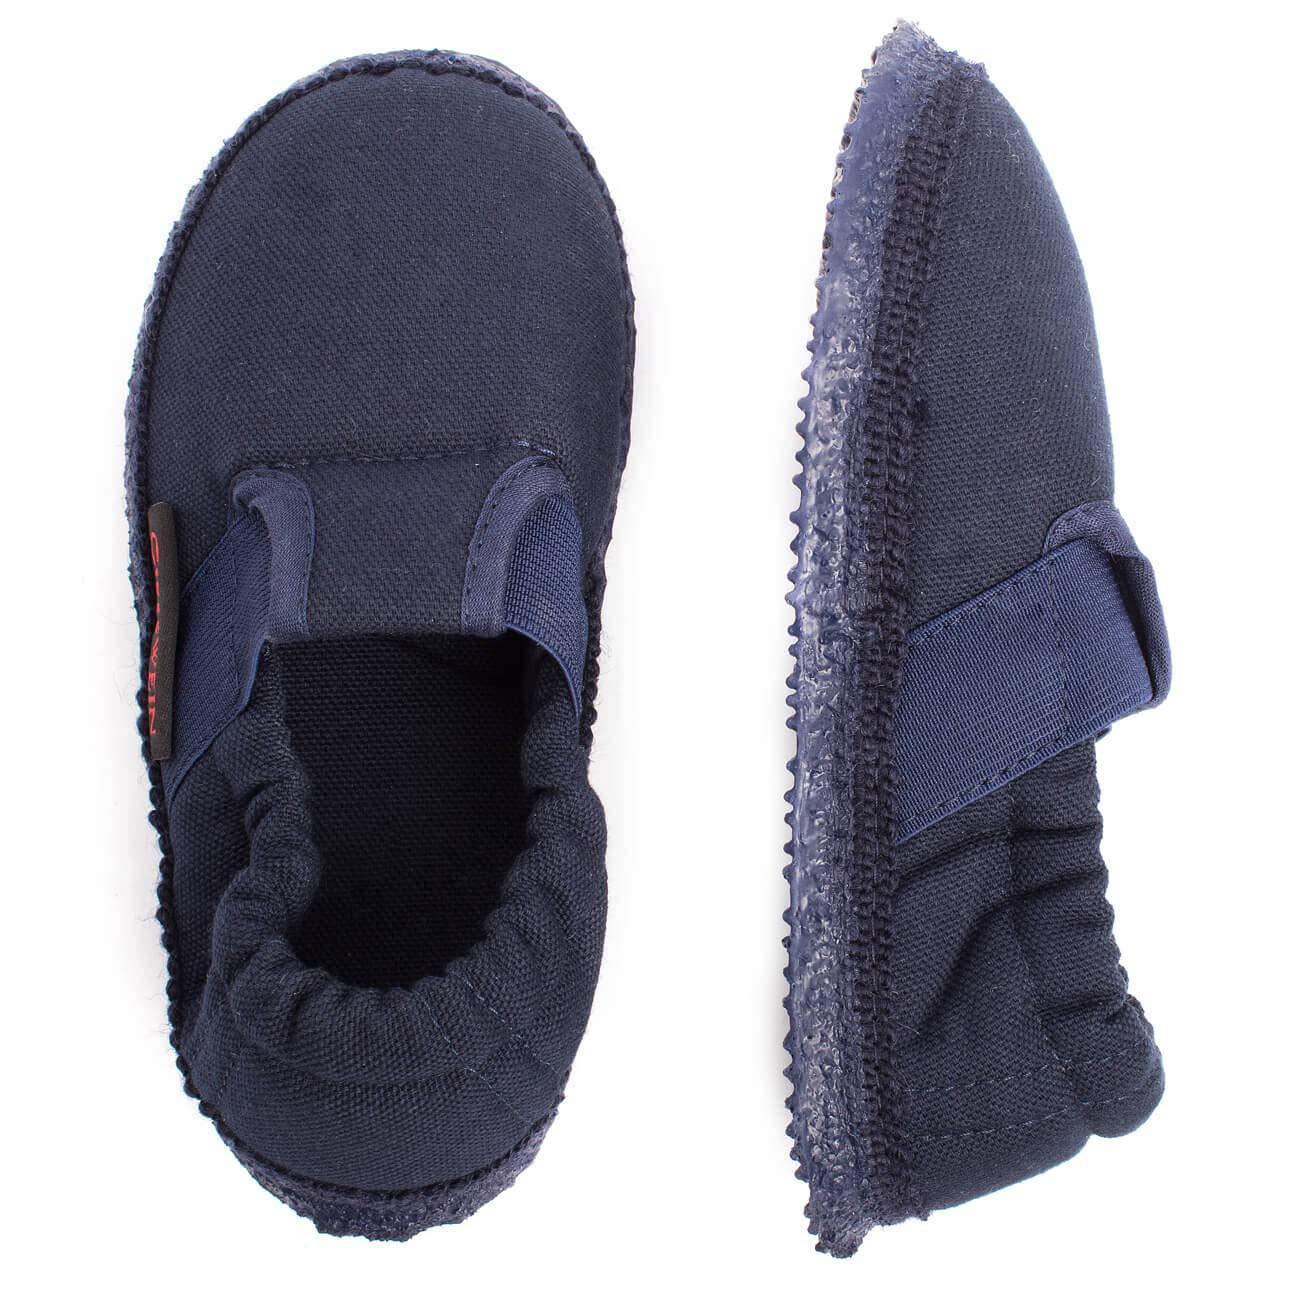 Giesswein Walkwaren AG Aichach Blu Ocean 588 37 EU Pantofole a Collo Basso Unisex-Bambini